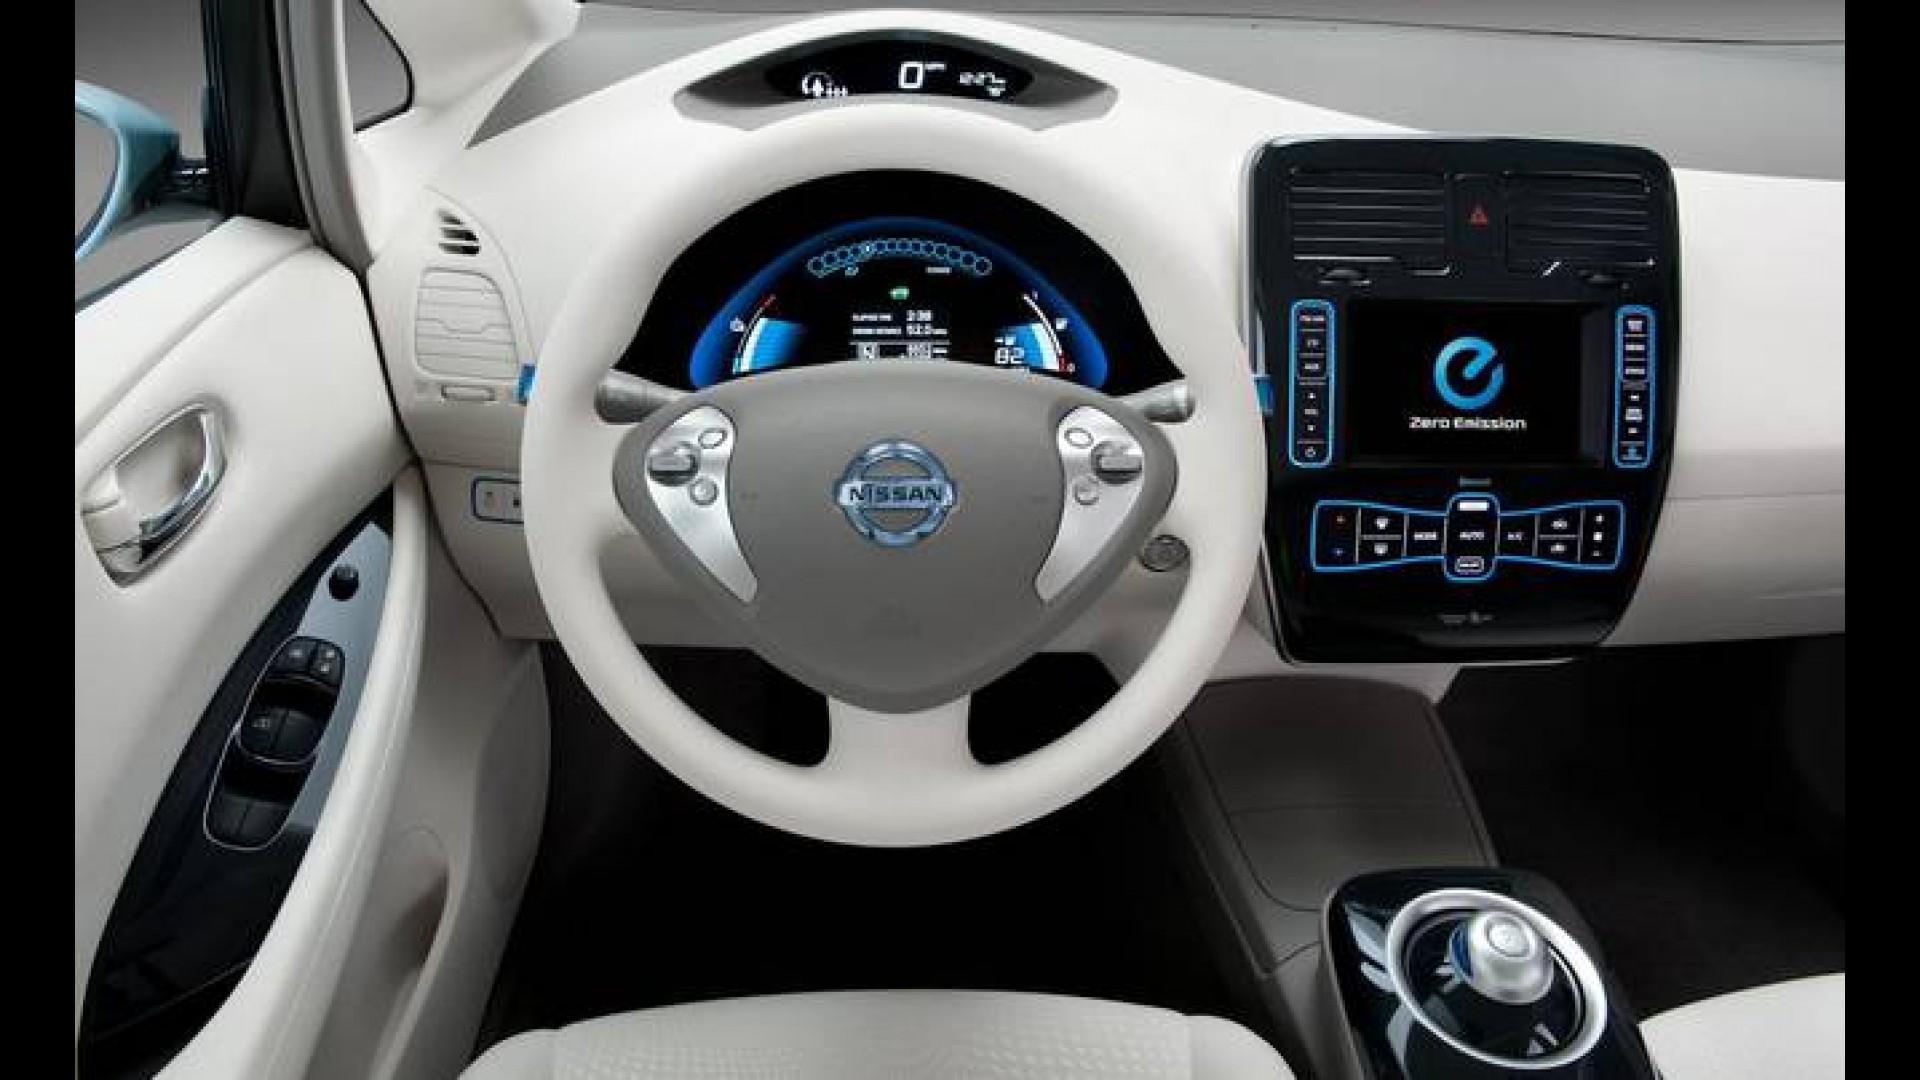 Nissan Micra (Ниссан Микра) - цена, отзывы, характеристики ...